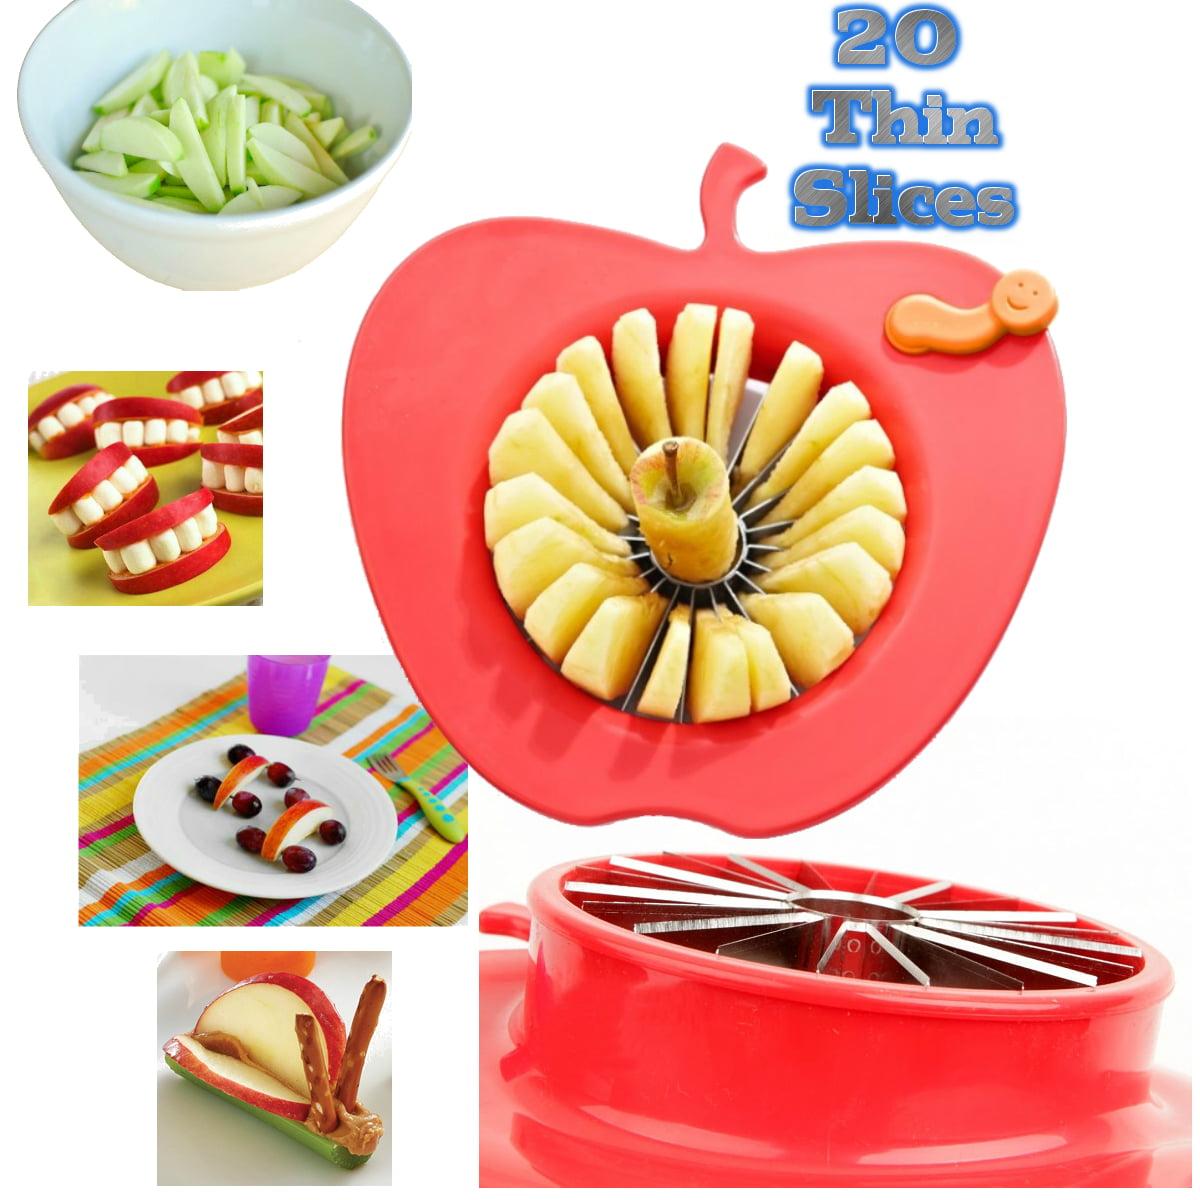 Corer Slicer Peeler and Divider Set Cuts 20 Thin Apple Slices For Kids Onion Slicer for Vegetables Tomato... by